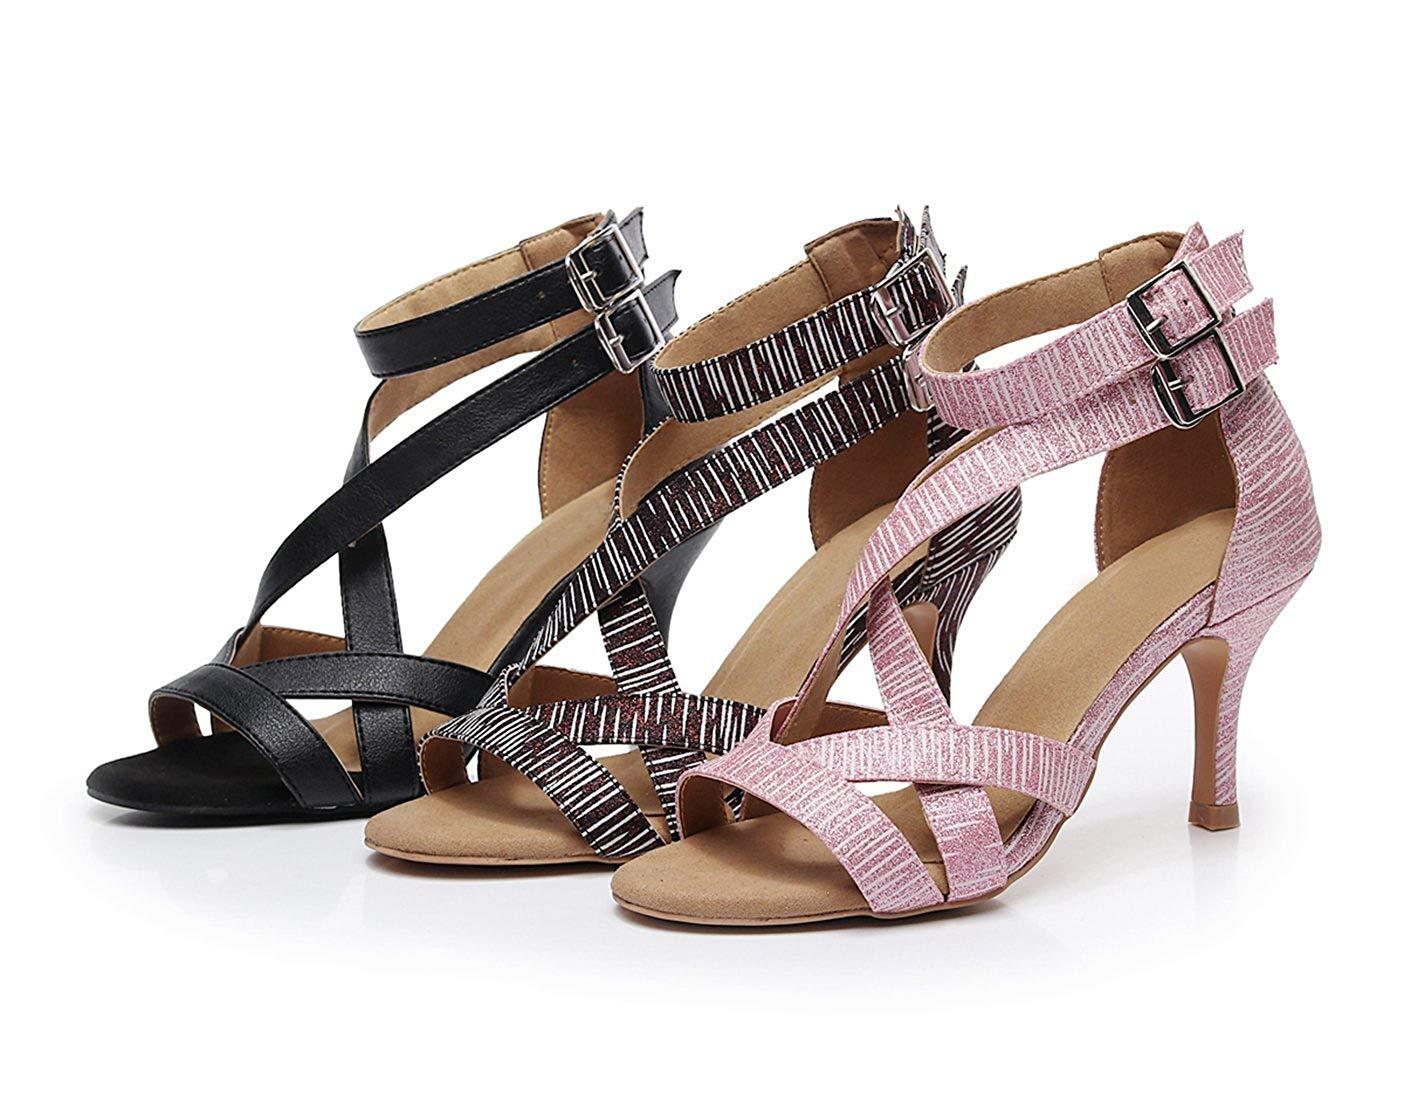 HhGold Damen Soft Rubber Sole Latin Knöchelriemen Rosa Latin Sole Salsa Tanzschuhe Hochzeit Schuhe UK 6 5 (Farbe   - Größe   -) da53b9